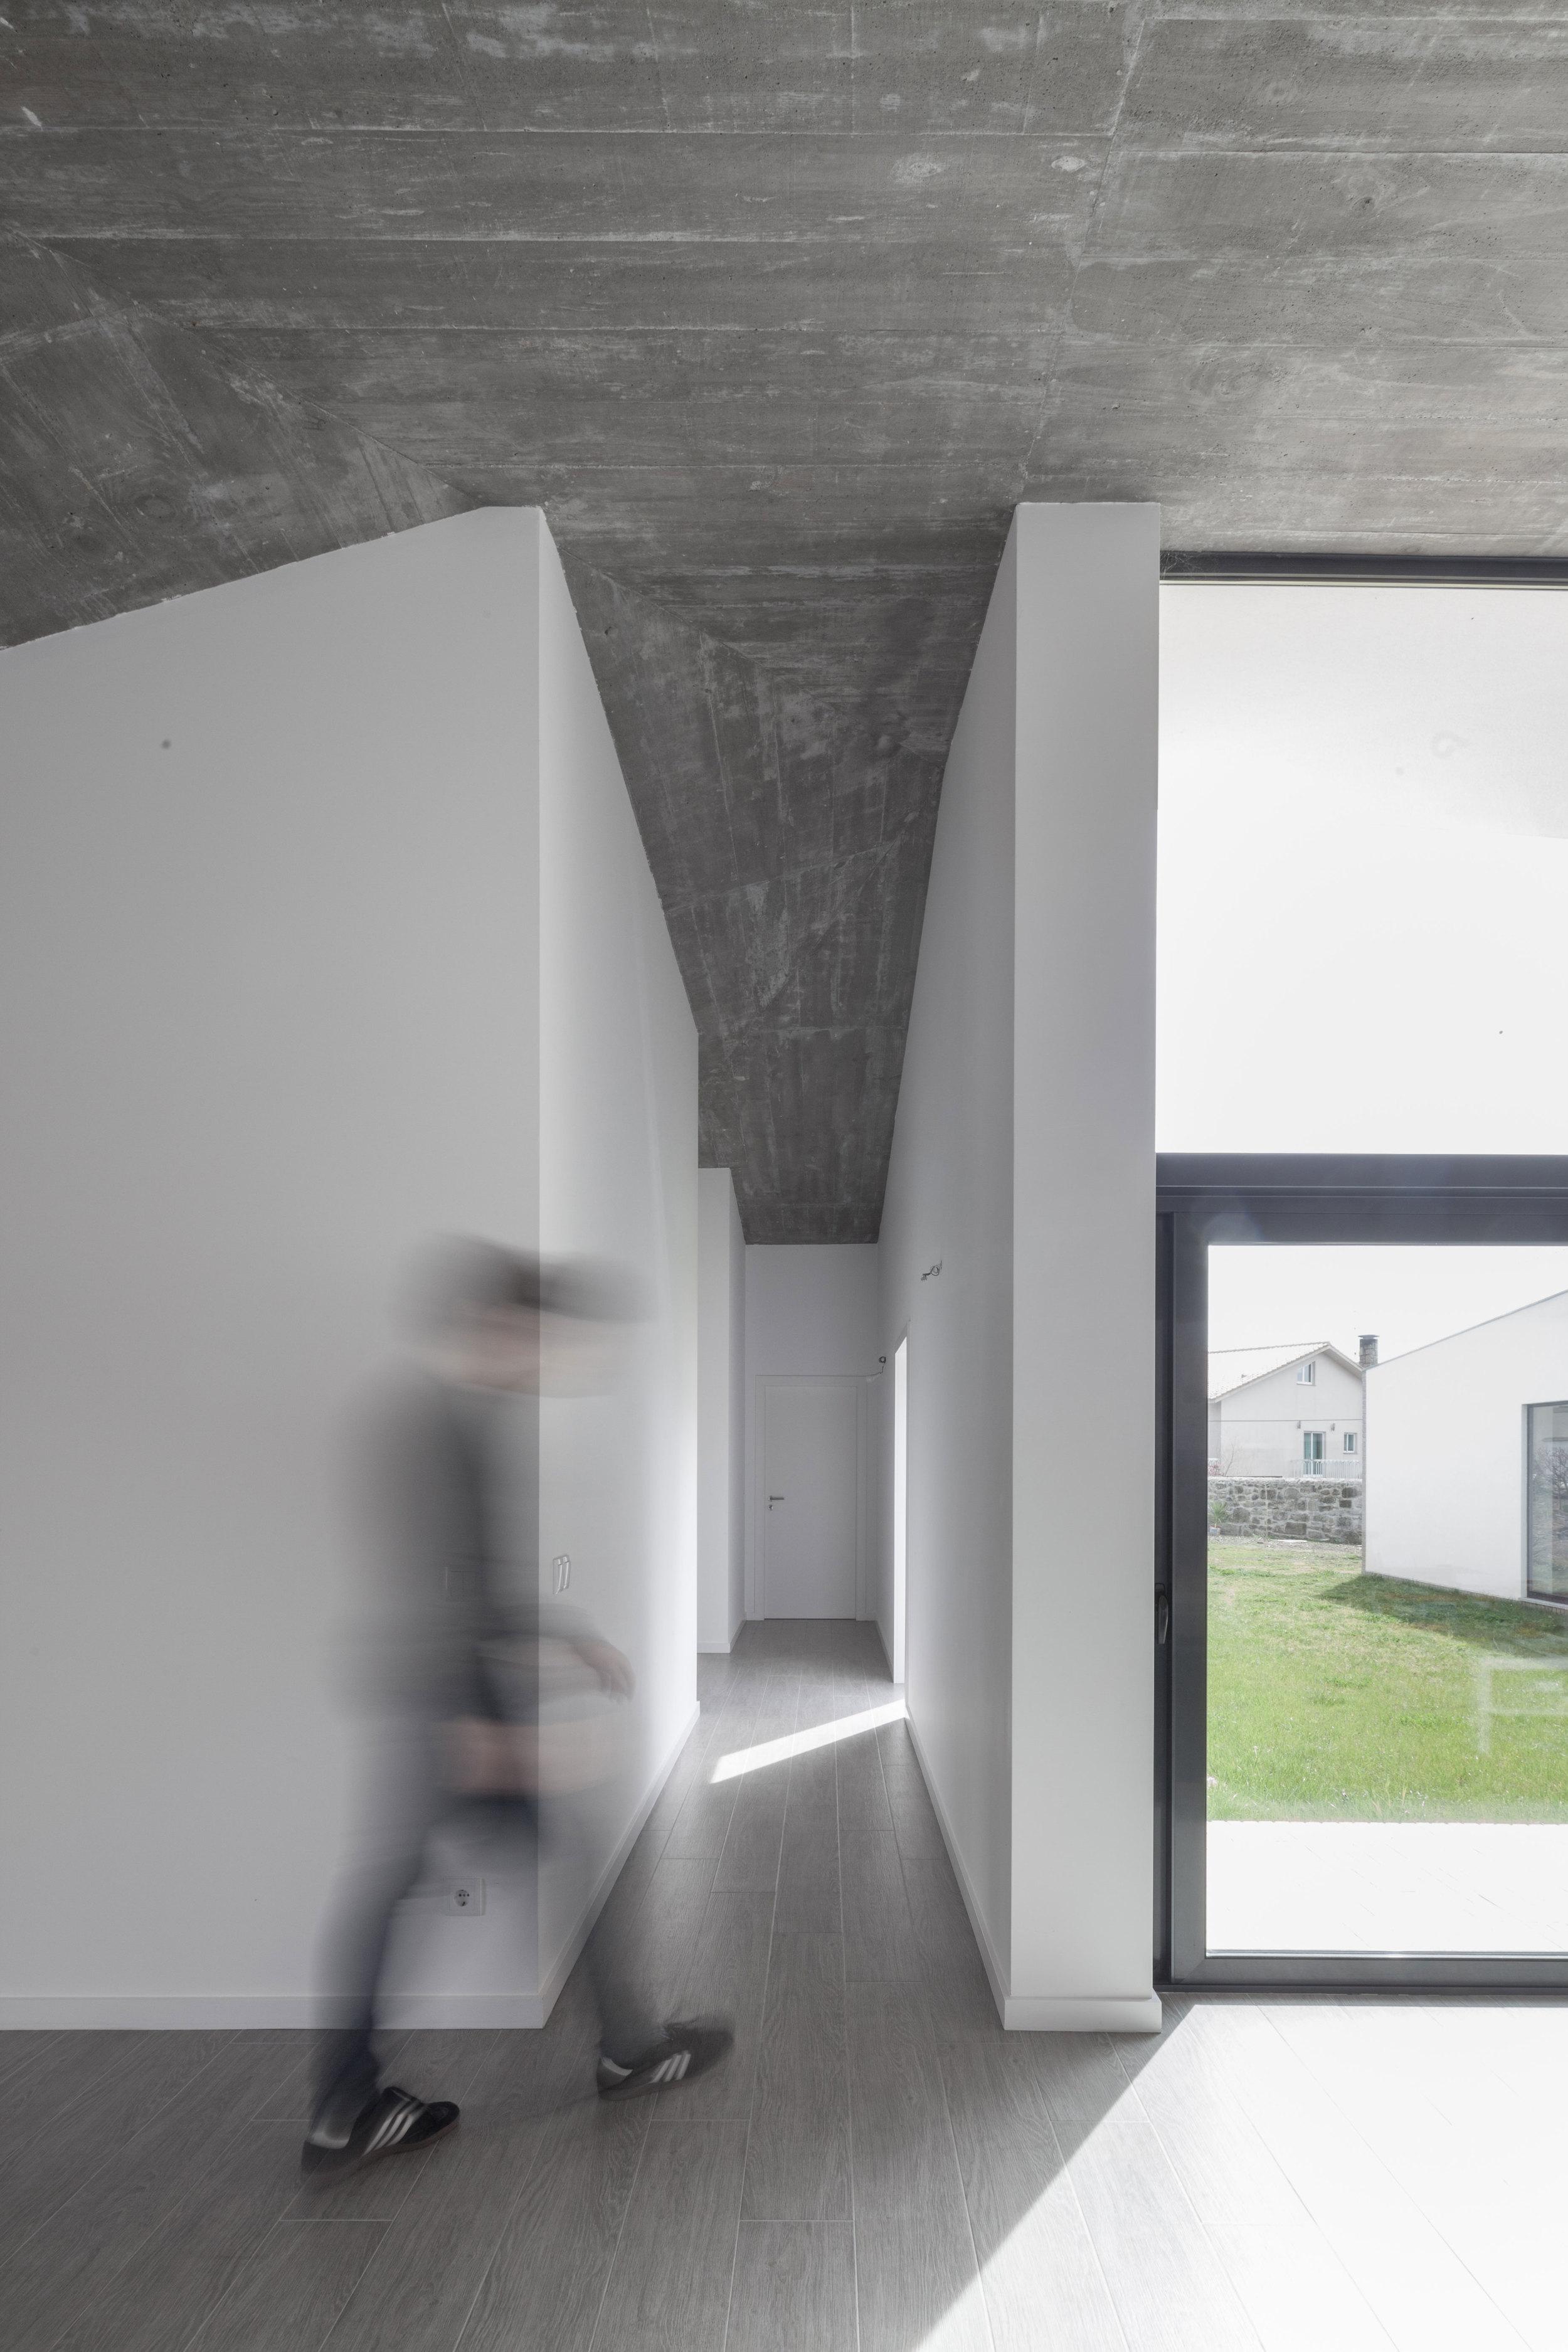 PROD_Open_patio_house_corridor_view_2.jpg